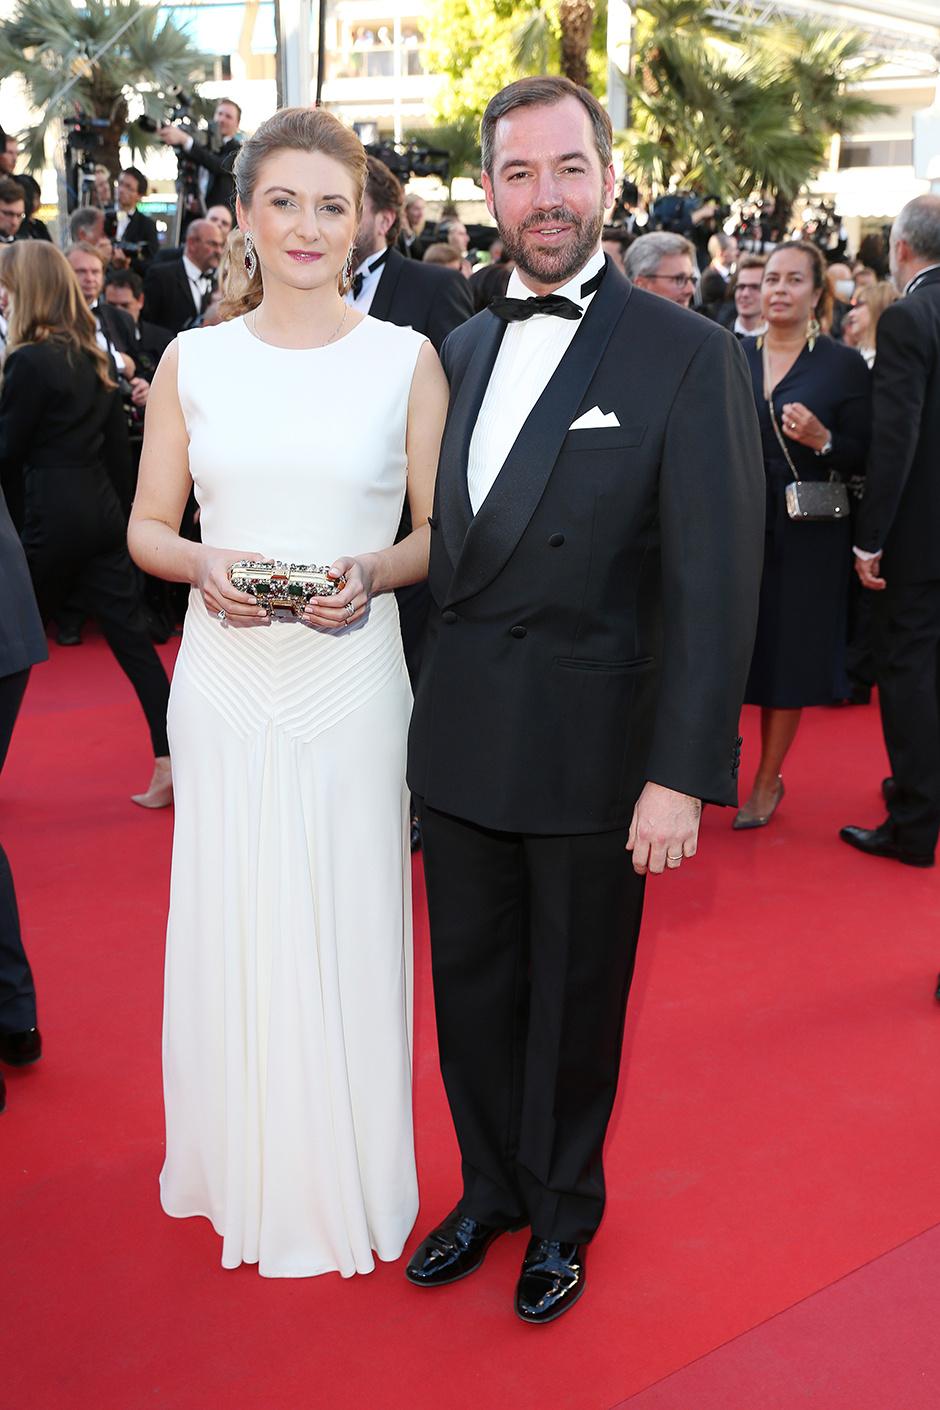 Принцесса Люксембурга Стефания и принц Люксембурга Гийом